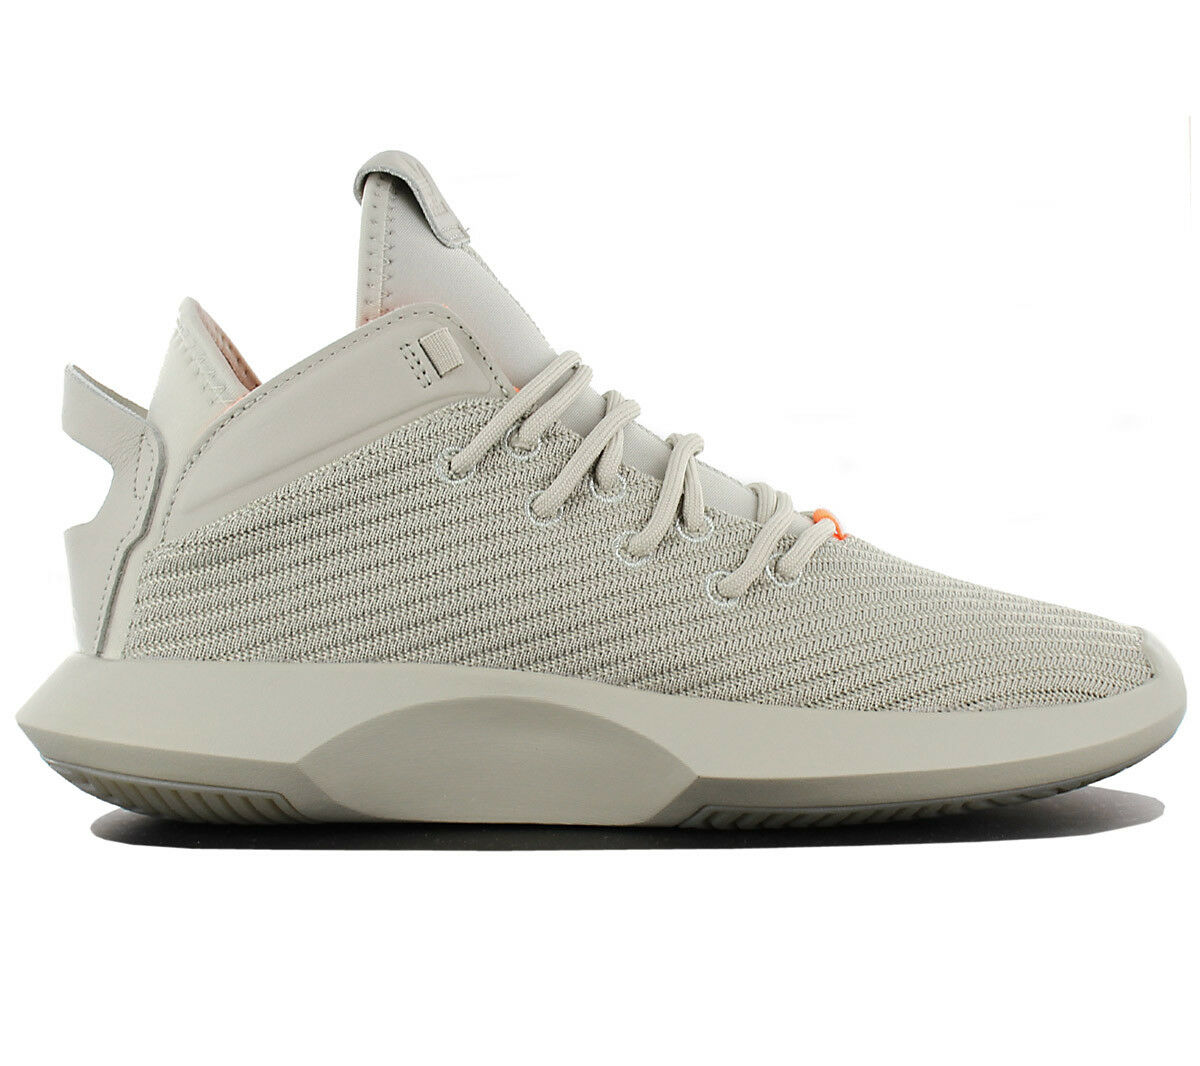 competitive price 6ab18 79259 Adidas Crazy 1 ADV CK Herren Turnschuhe Basketball Schuhe Turnschuhe CQ0981  CQ0981 Turnschuhe NEU 26577c